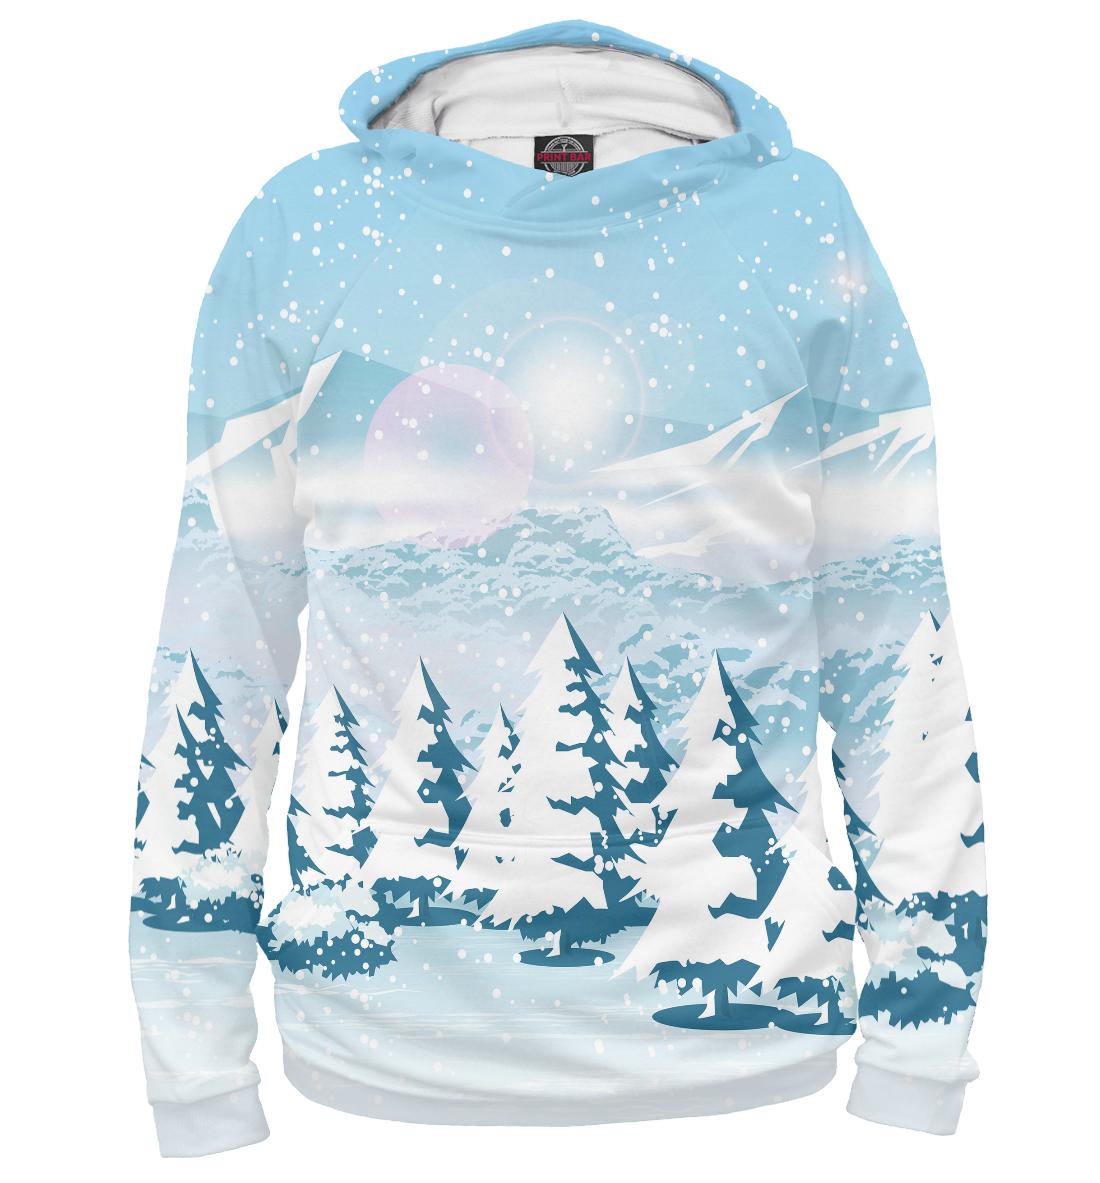 Зимний пейзаж, Printbar, Худи, PEY-100044-hud-1  - купить со скидкой